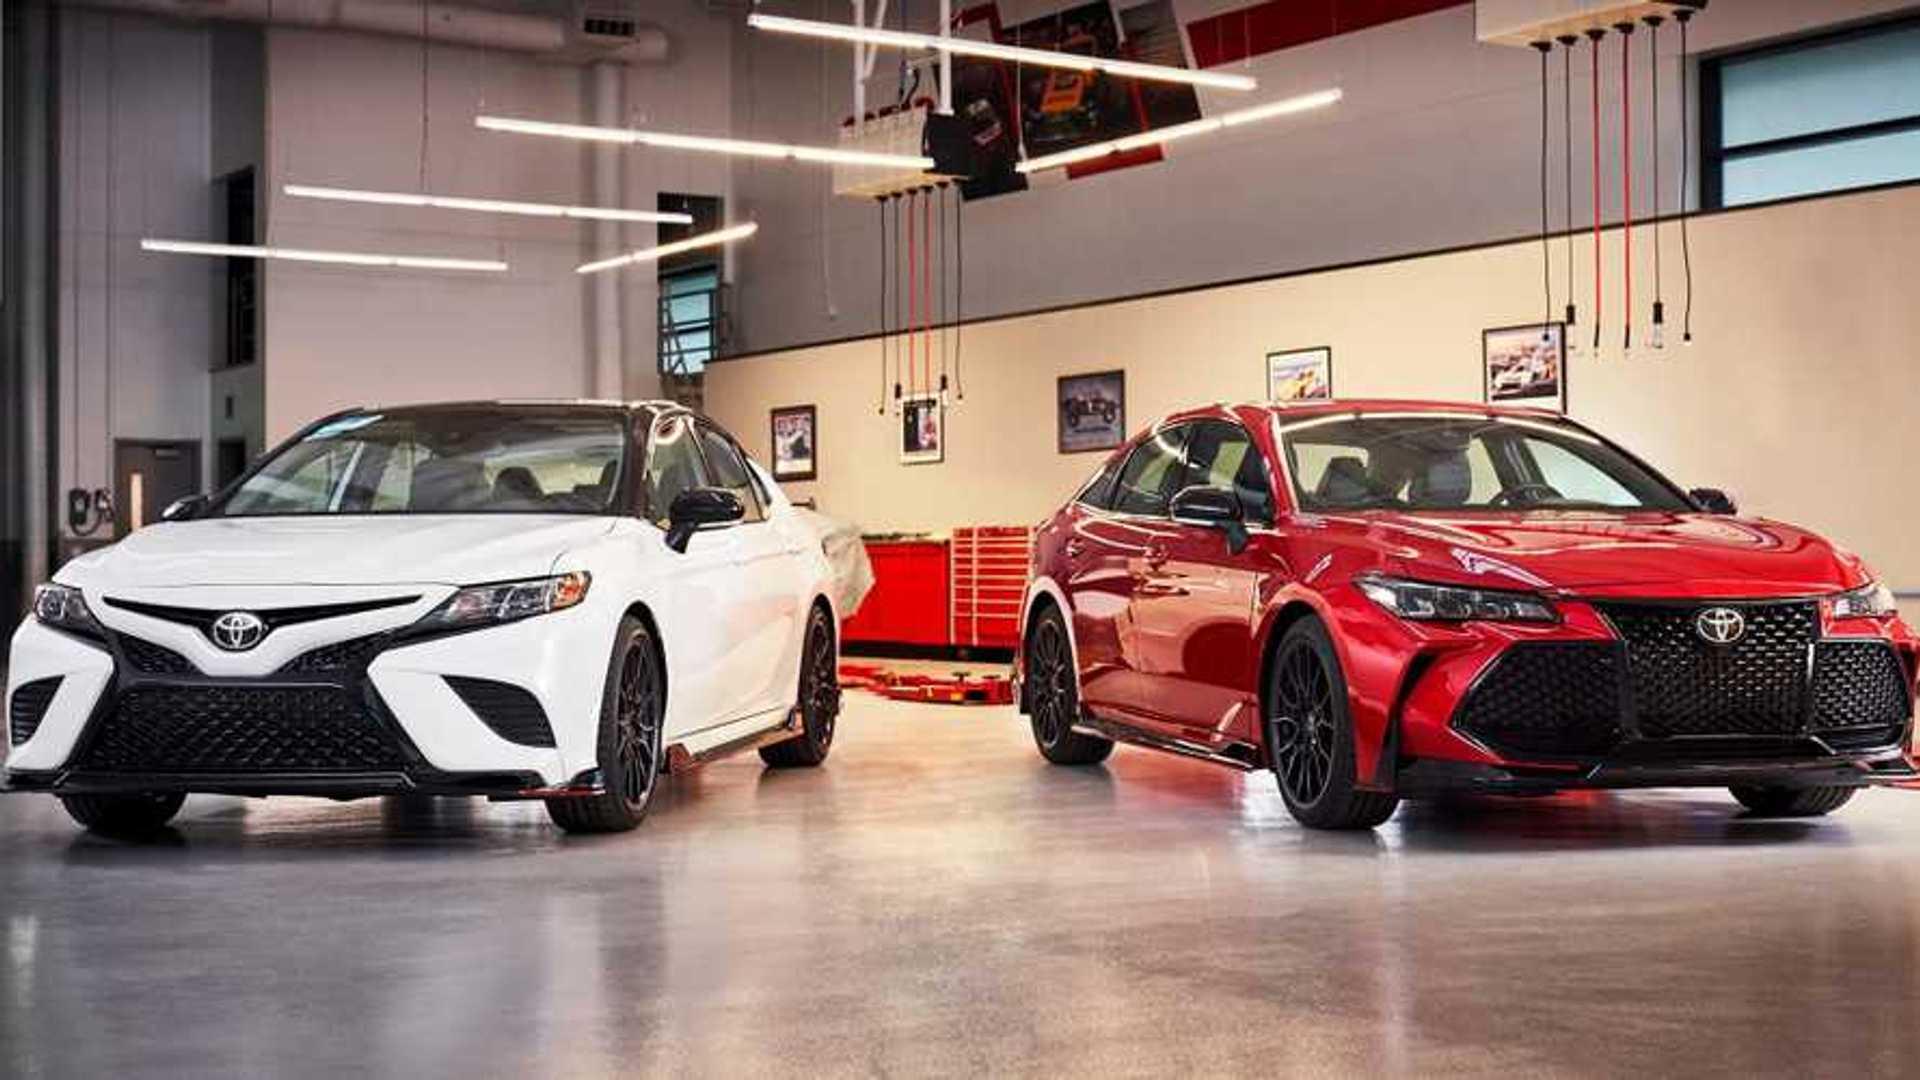 Toyota Camry, Avalon TRD Styling Tweaks Revealed In New Teaser